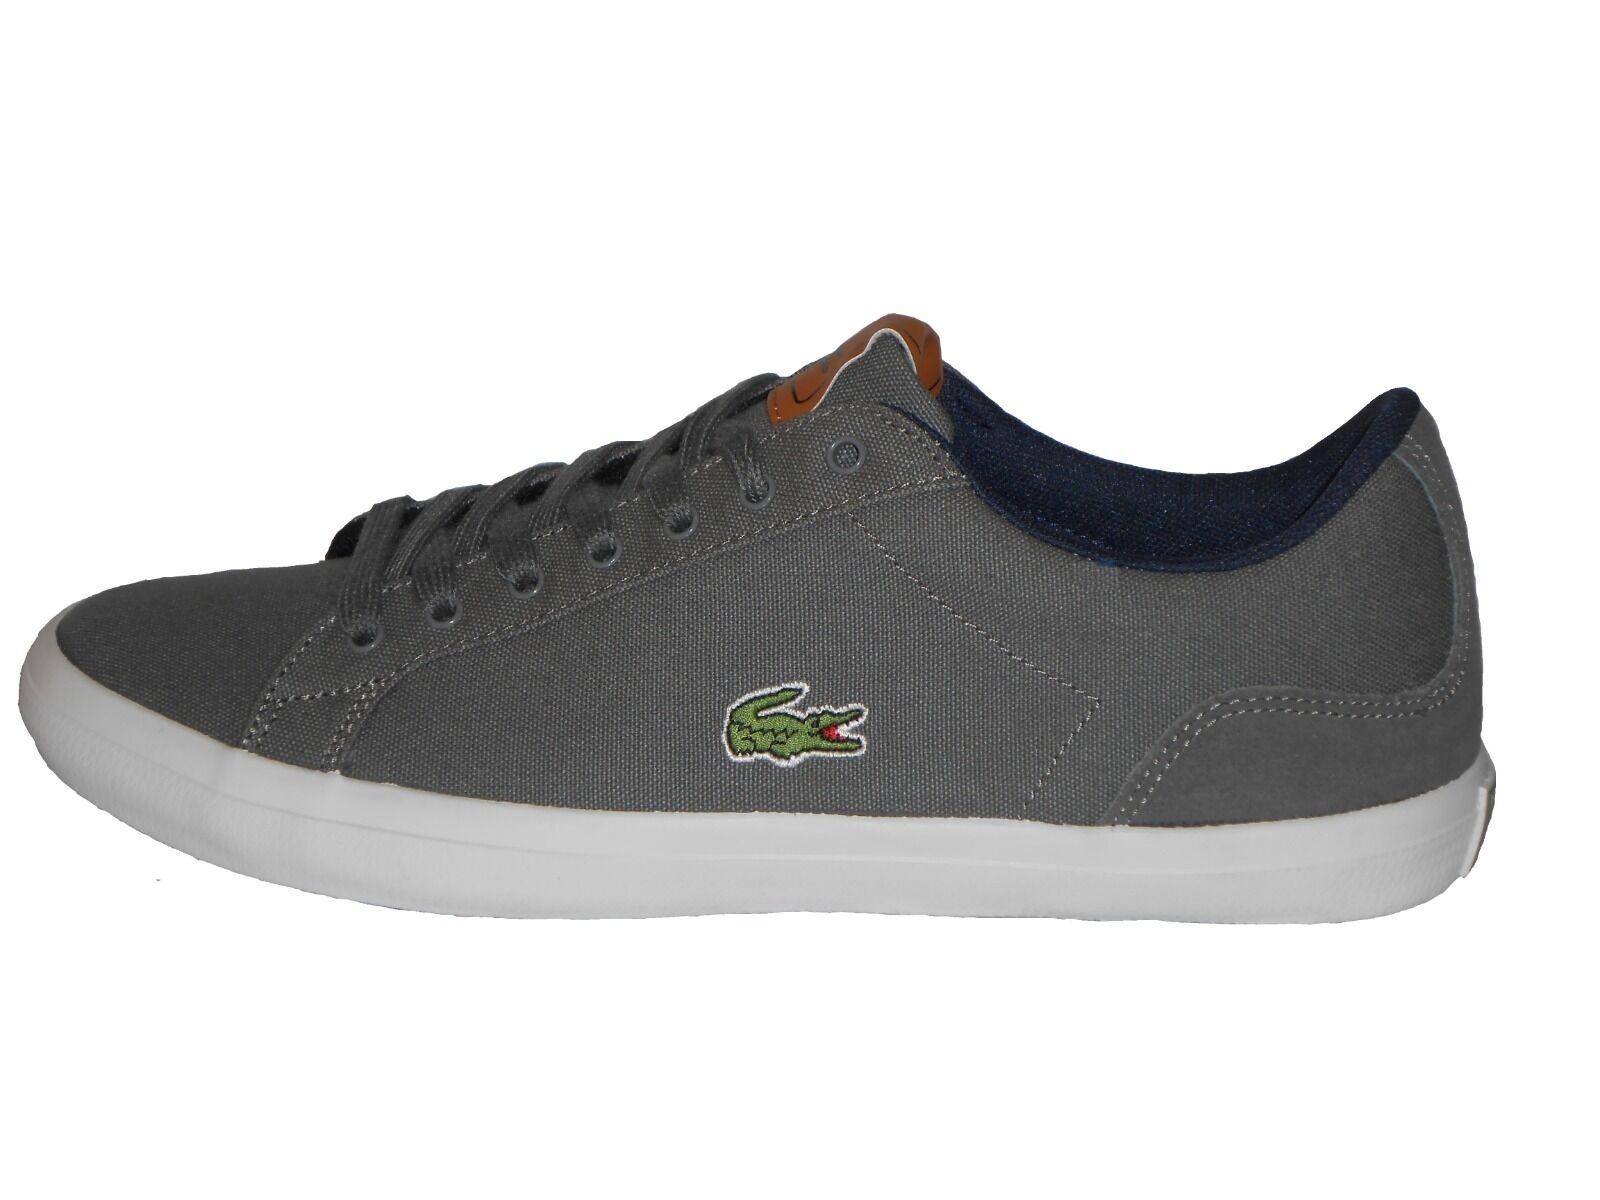 Lacoste Lerond S316 1 SPM Para hombre Zapatilla Zapato Gris Oscuro Talla 6   70/- Nuevo